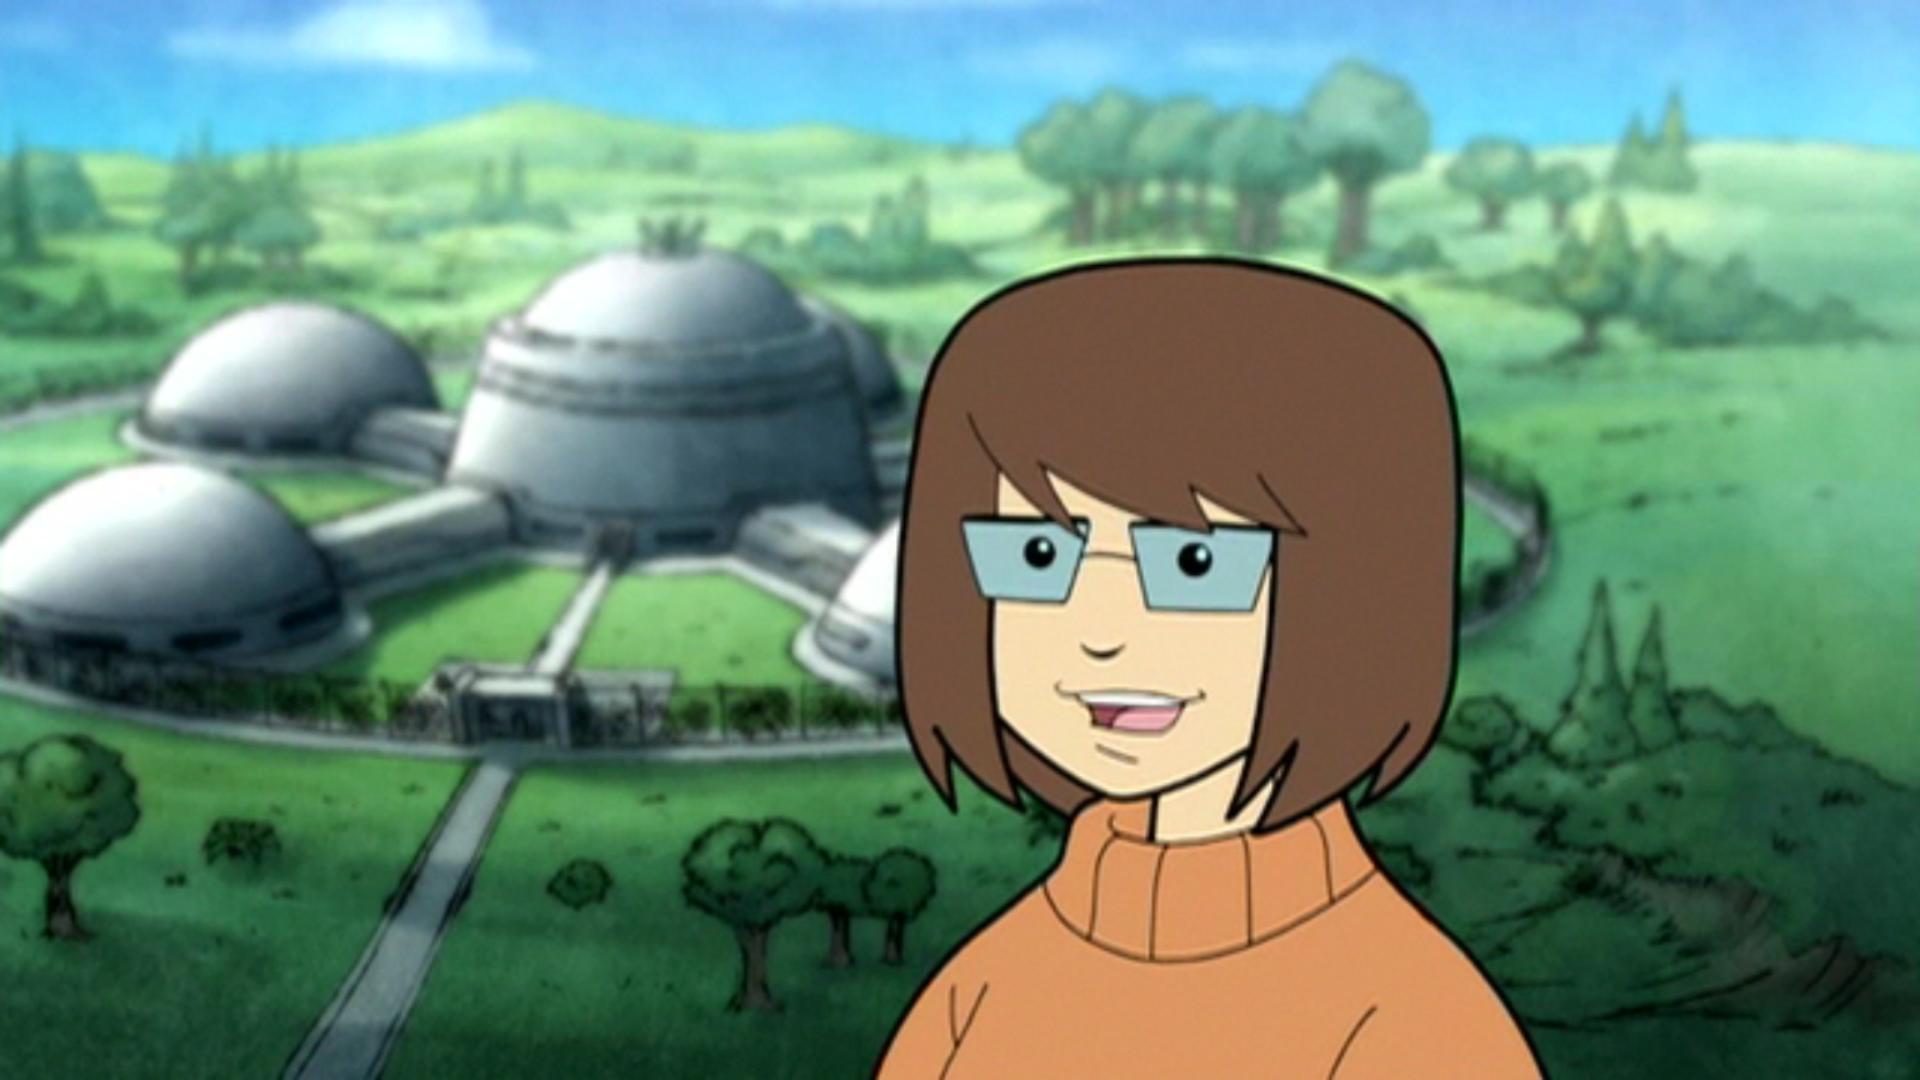 Velma Dinkley Shaggy Scooby Doo Get A Clue Scoobypedia Fandom